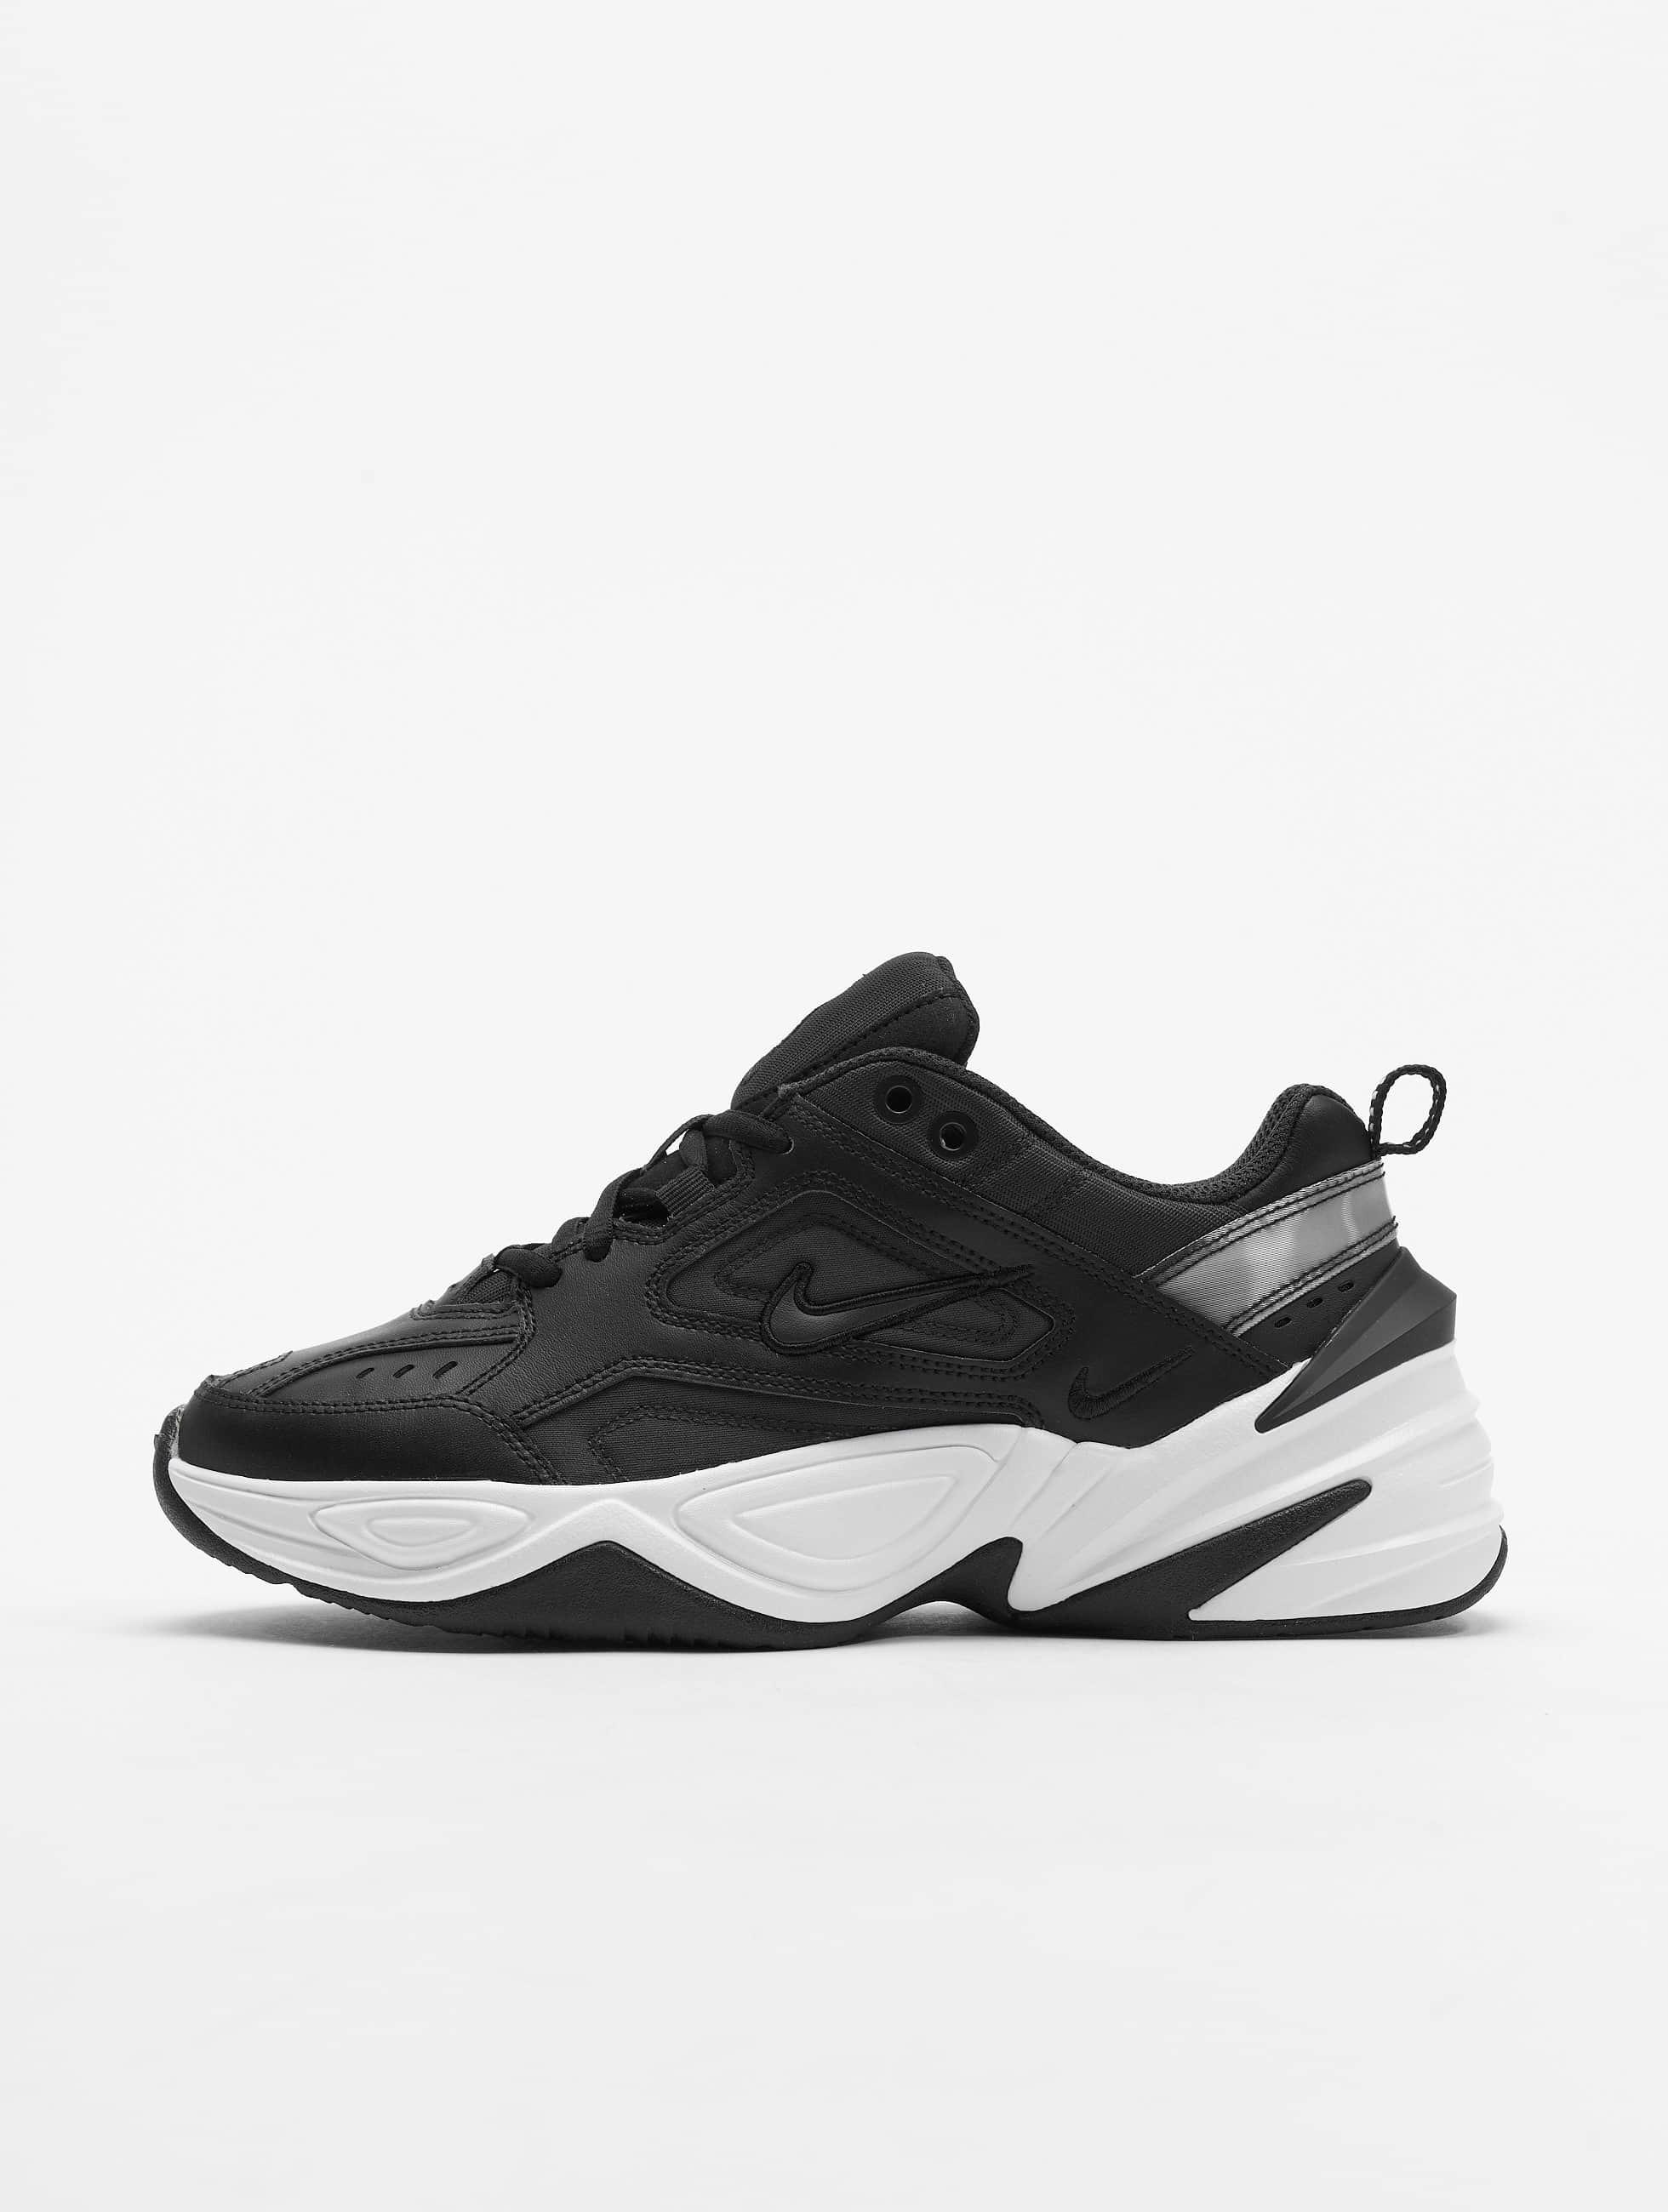 Noir NikeM2k Femme 661812 Baskets Tekno tsrdBQhxC